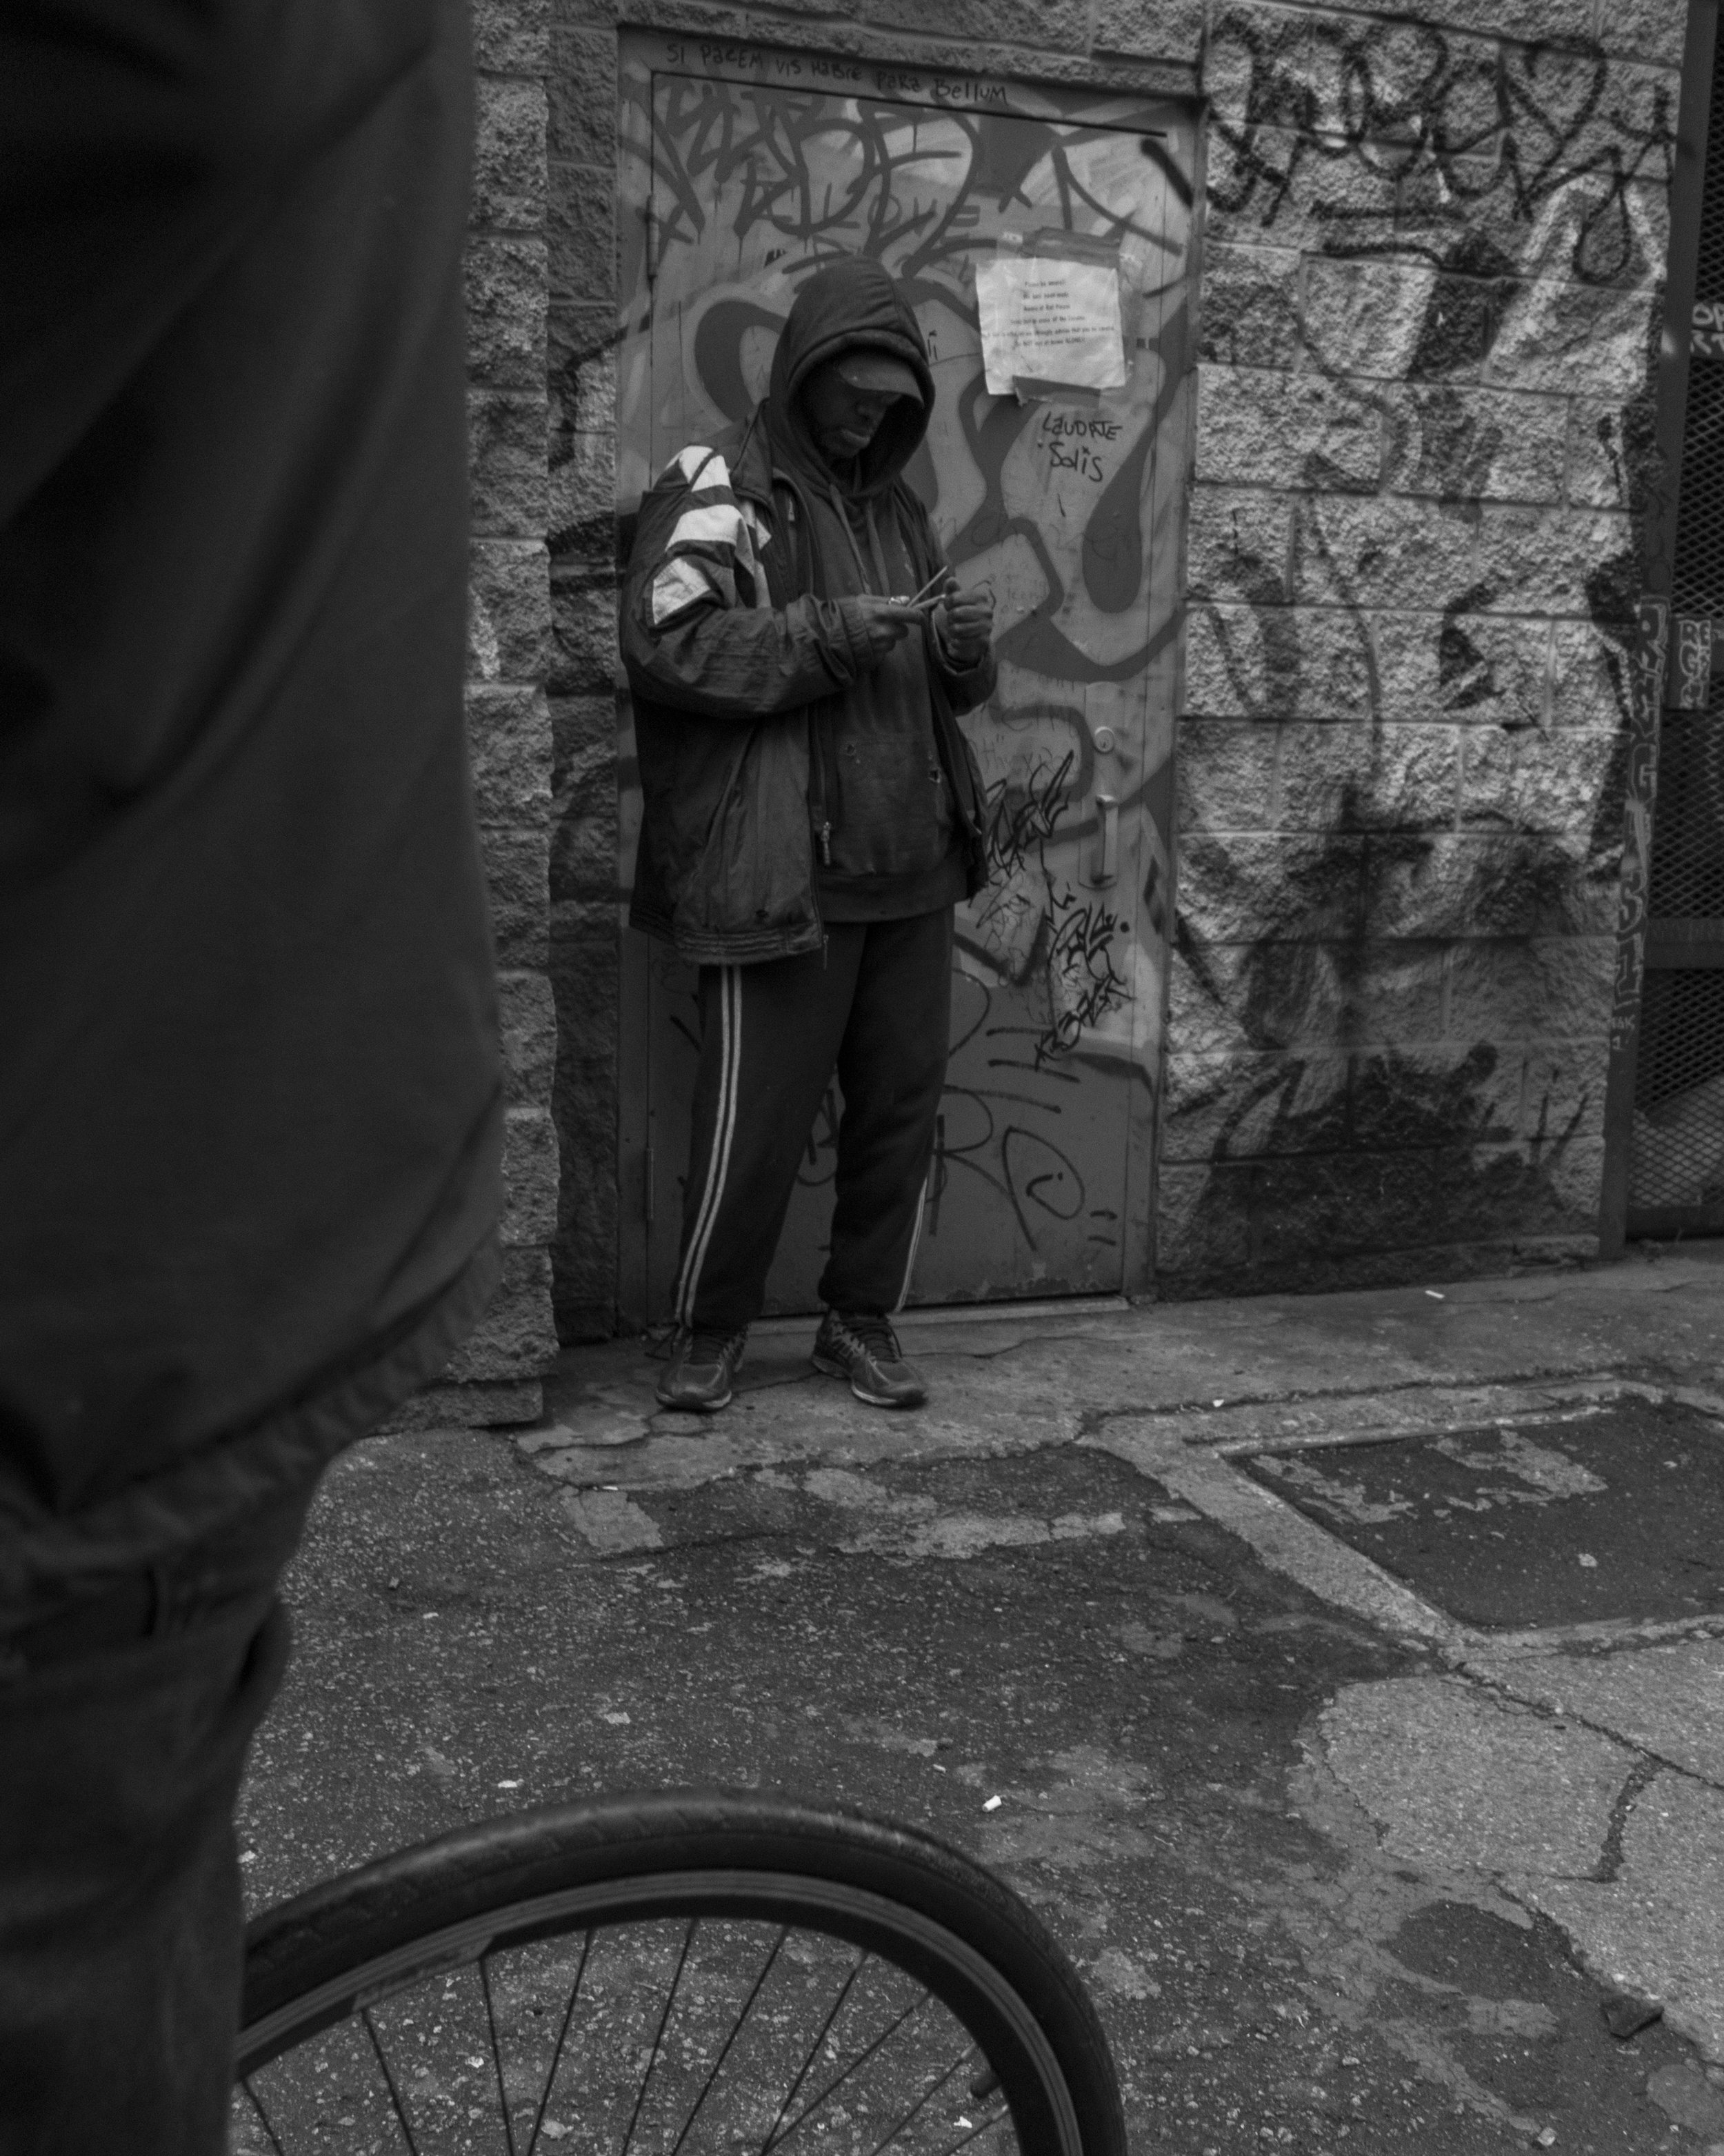 171110_street_Phot-172.jpg